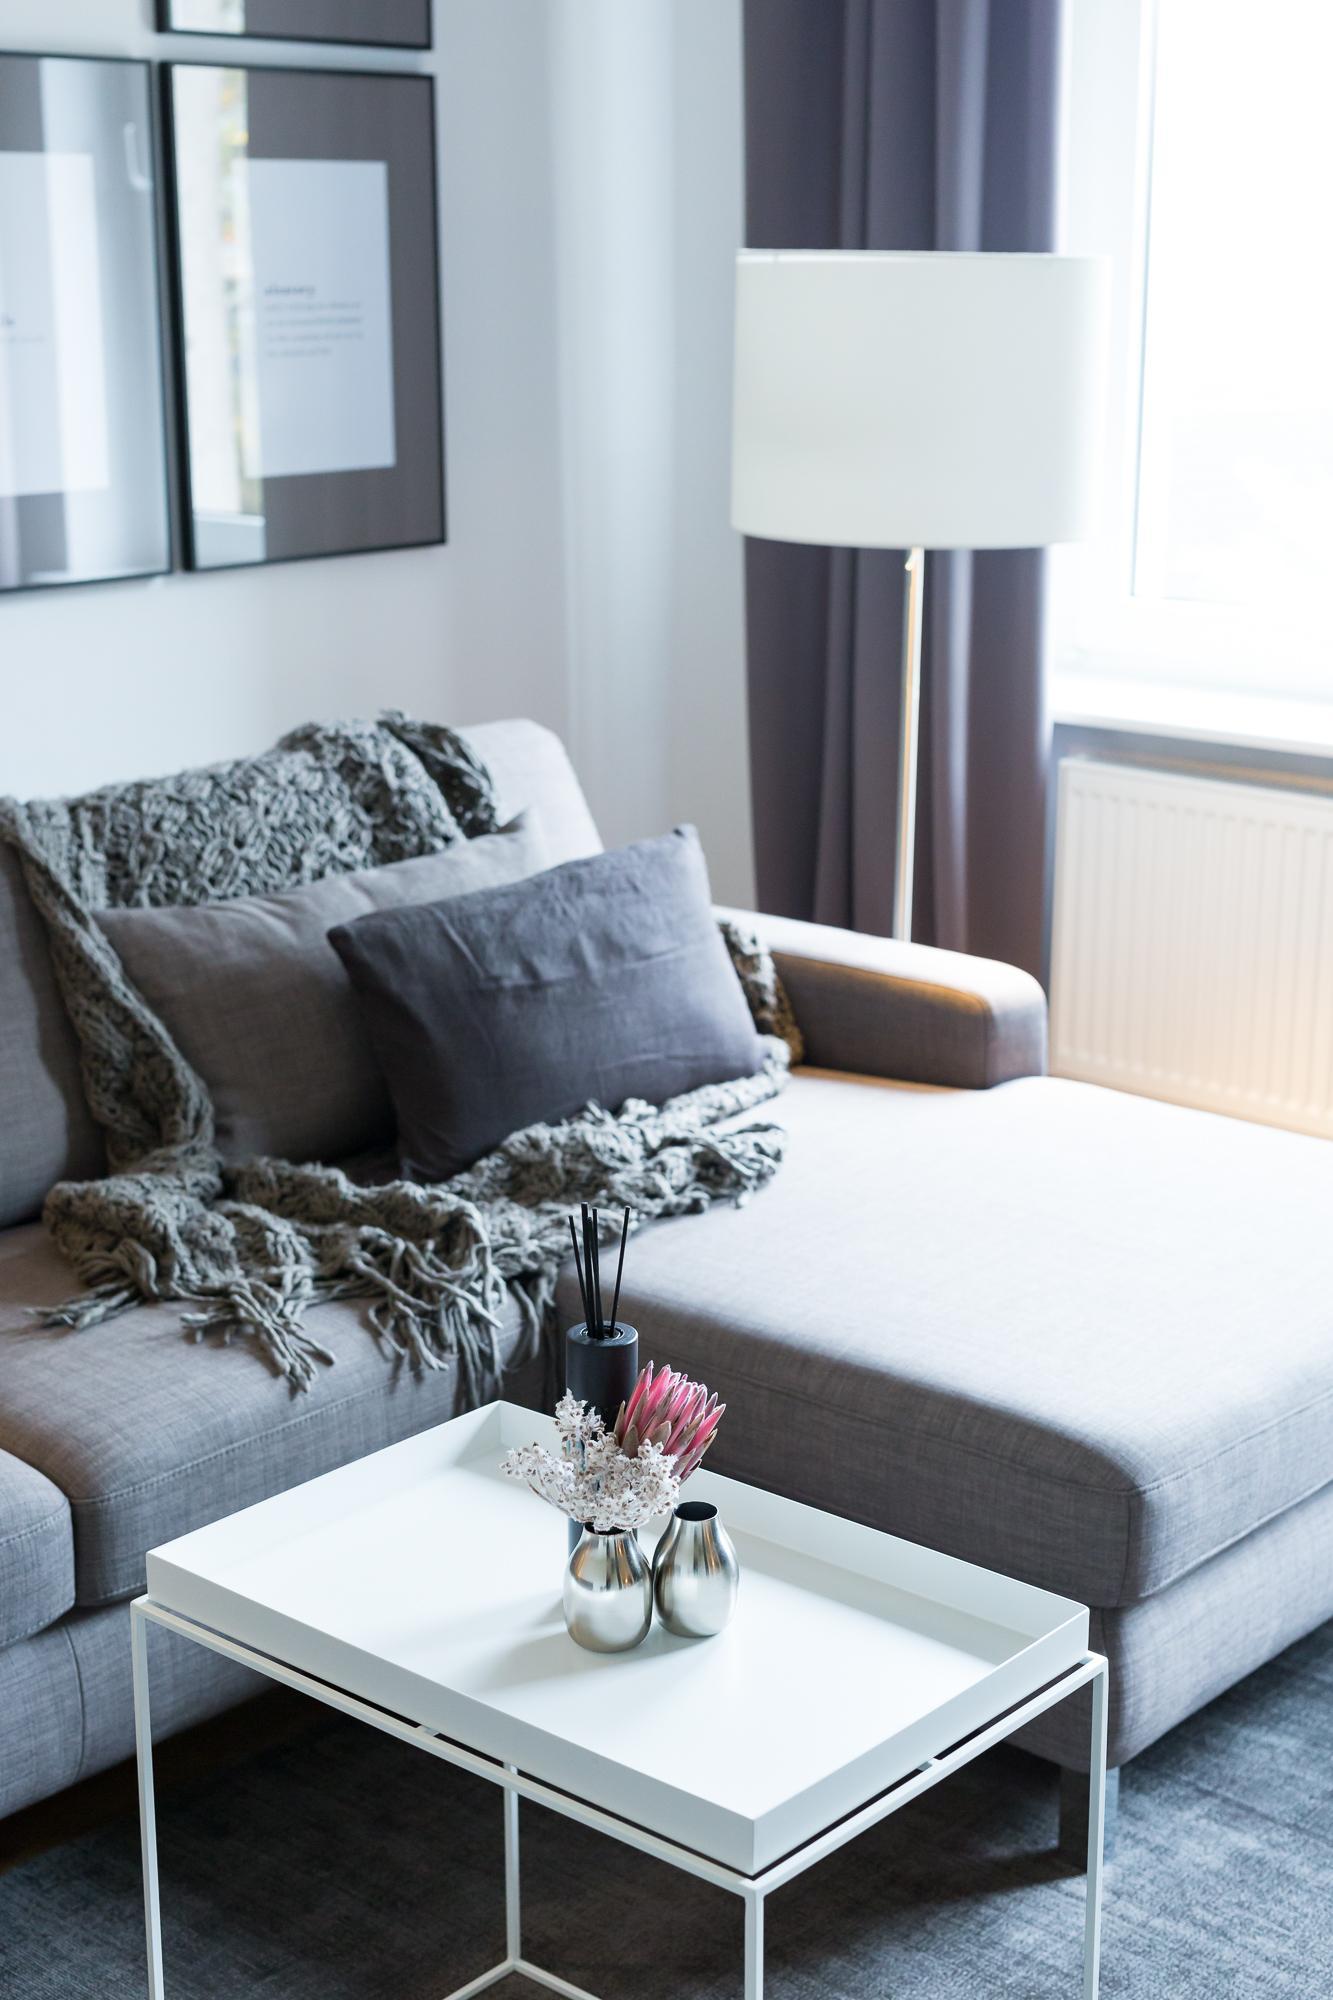 Charming #homestory #wohnzimmer #sofa #hygge #coffeetable #wanddeko #grau Nice Design